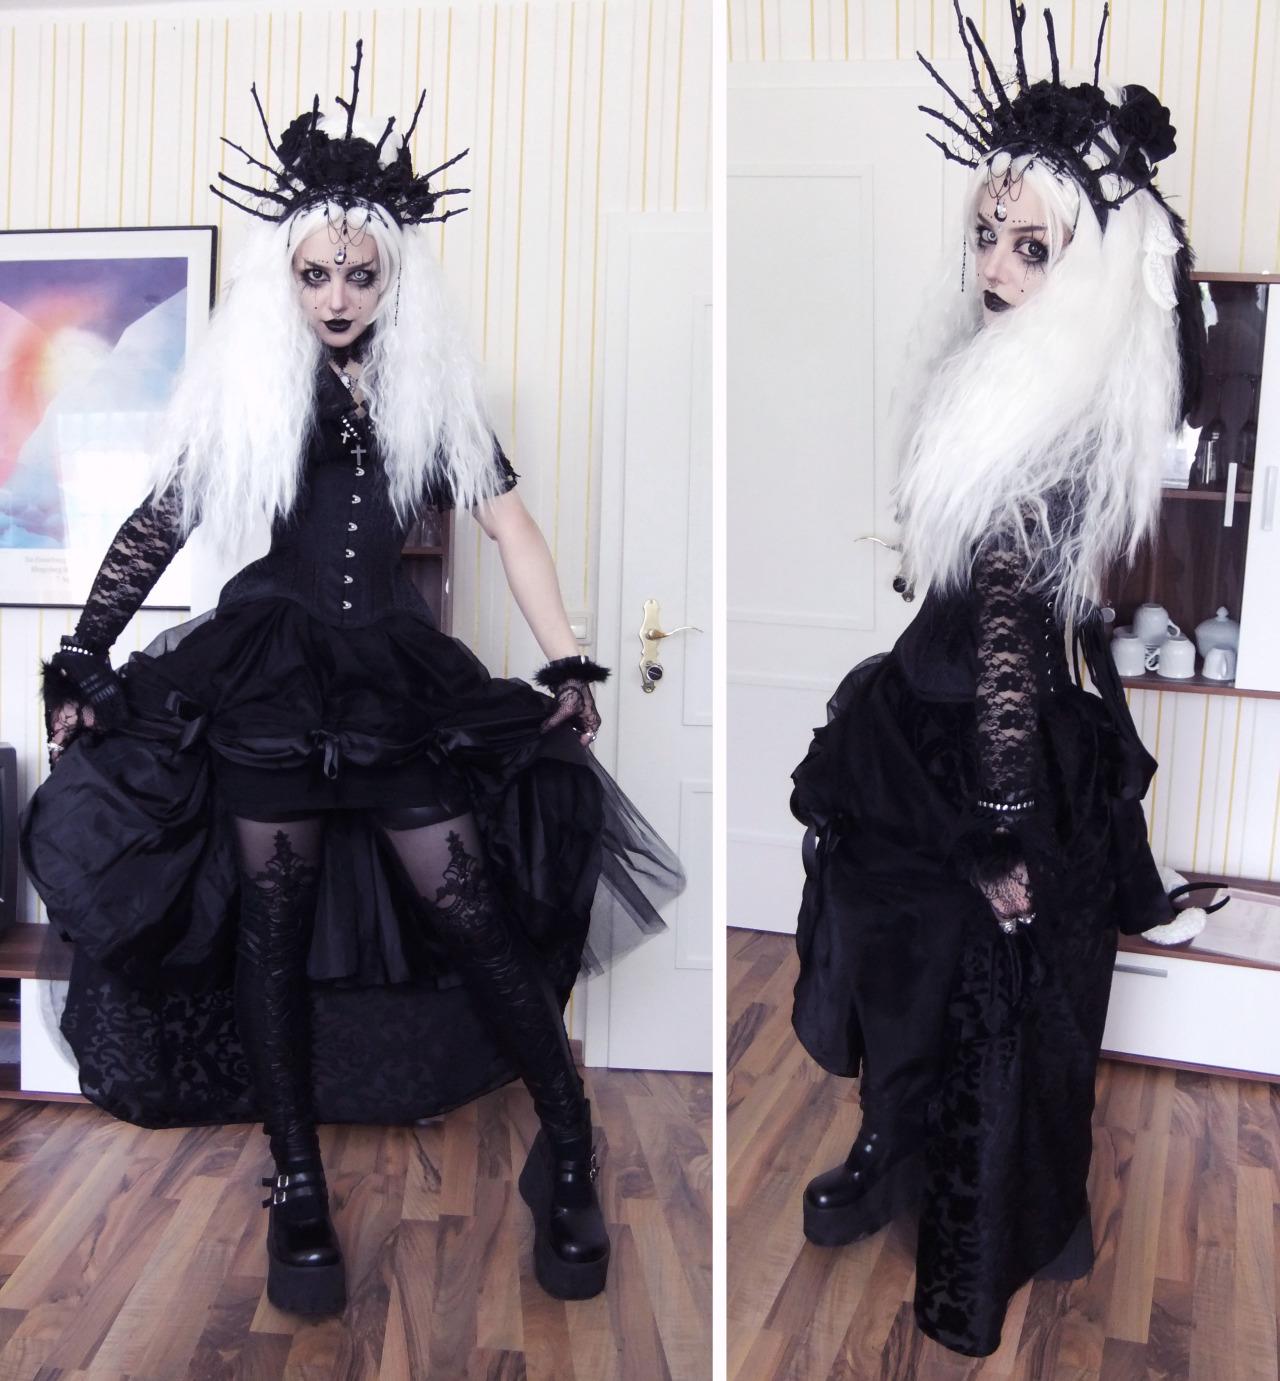 milieux gothic alternative fashion clothing - HD1280×1381